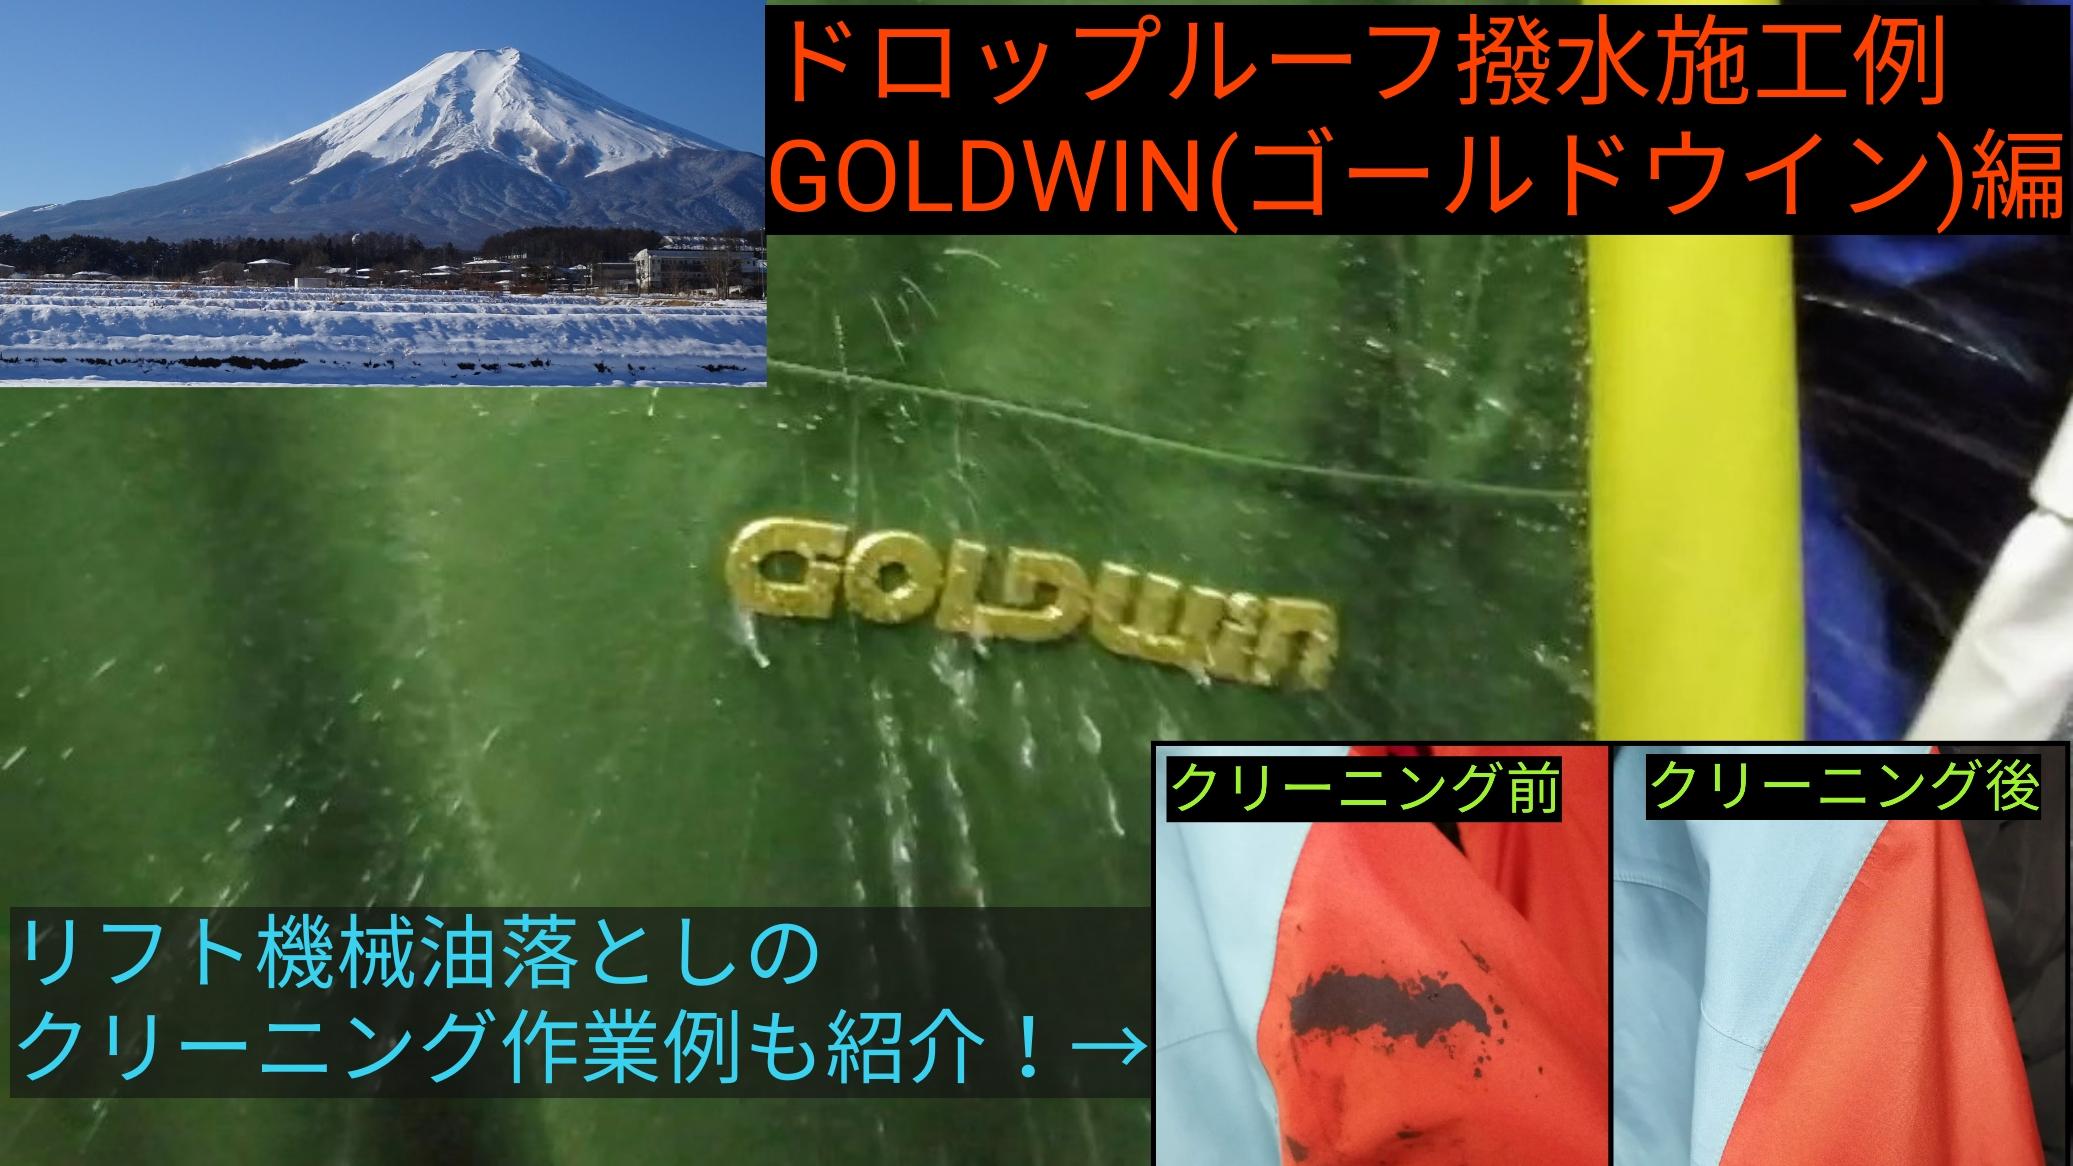 [GOLDWIN(ゴールドウイン)編]ドロップルーフメーカー別撥水施工例紹介!![スノーウェア撥水・クリーニング]